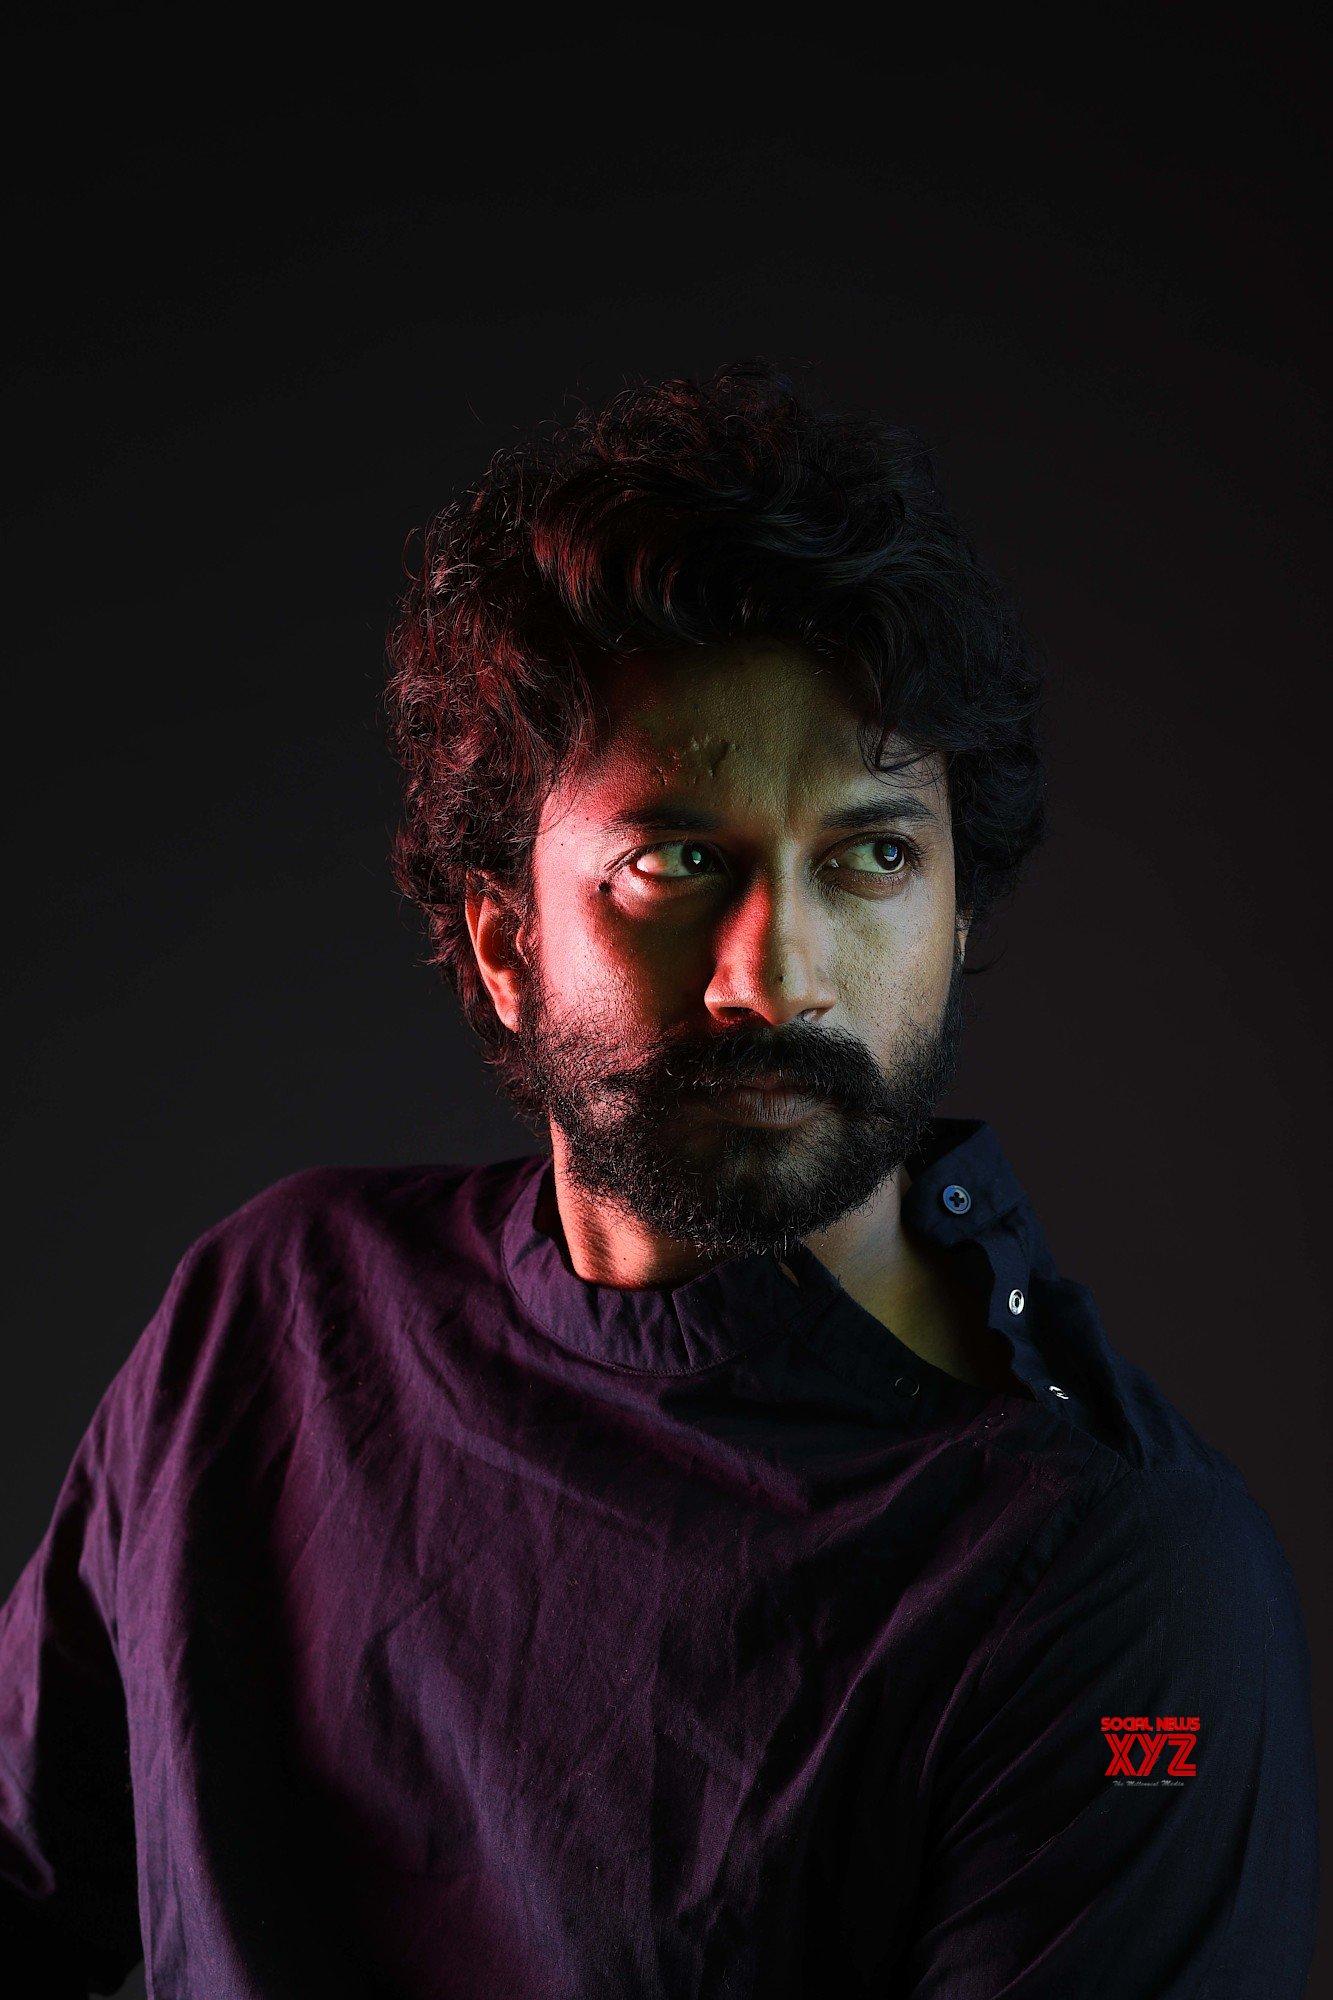 Aha's Blockbuster Show Locked Starring Satyadev Kancharana Returns For Season Two